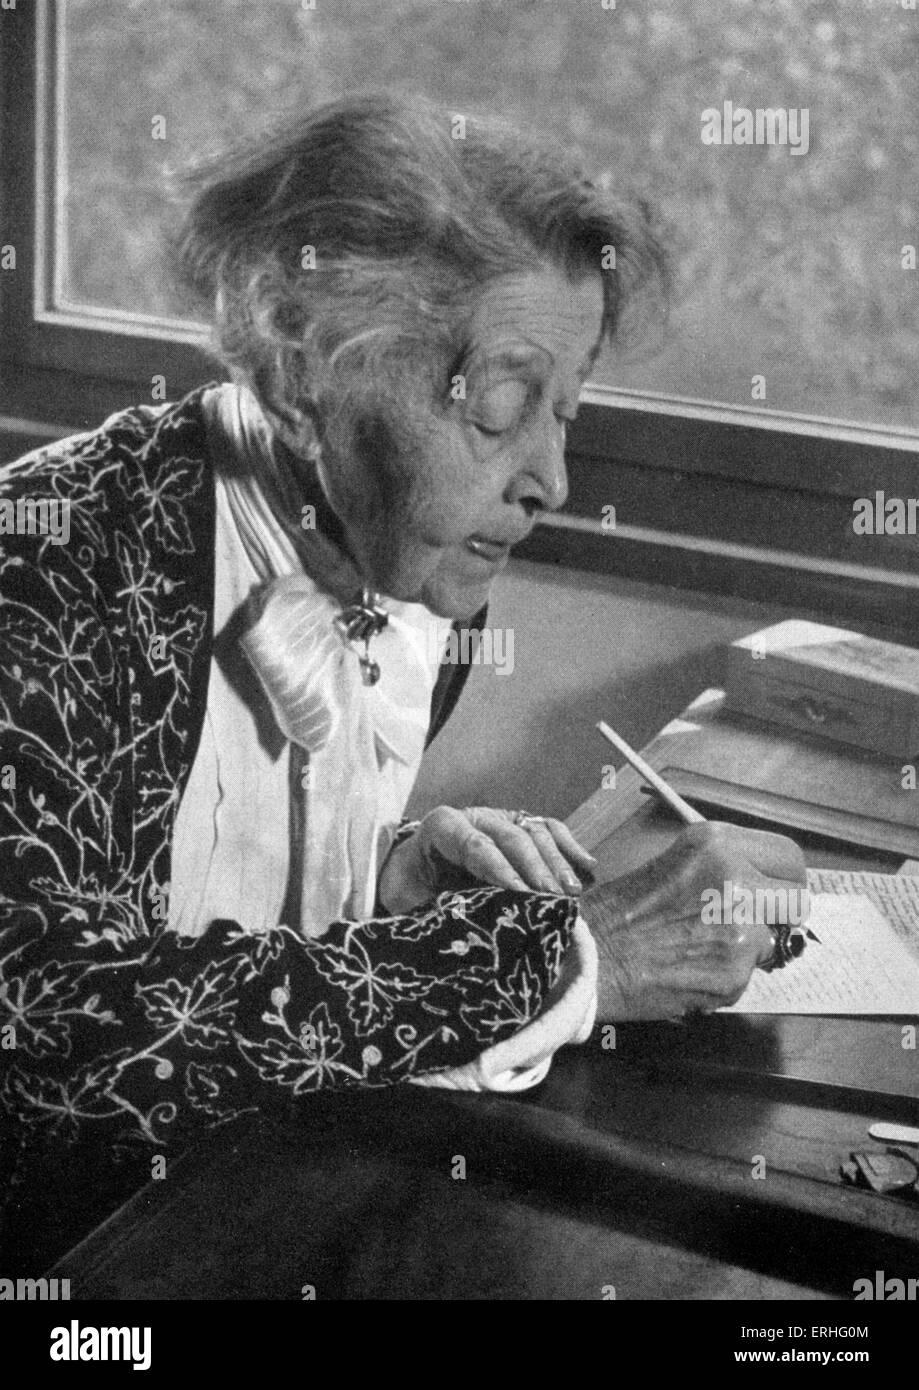 Ricarda Huch, portrait photograph taken 1947.  German novelist, poet, cultural historian. August 18 1864 - November - Stock Image